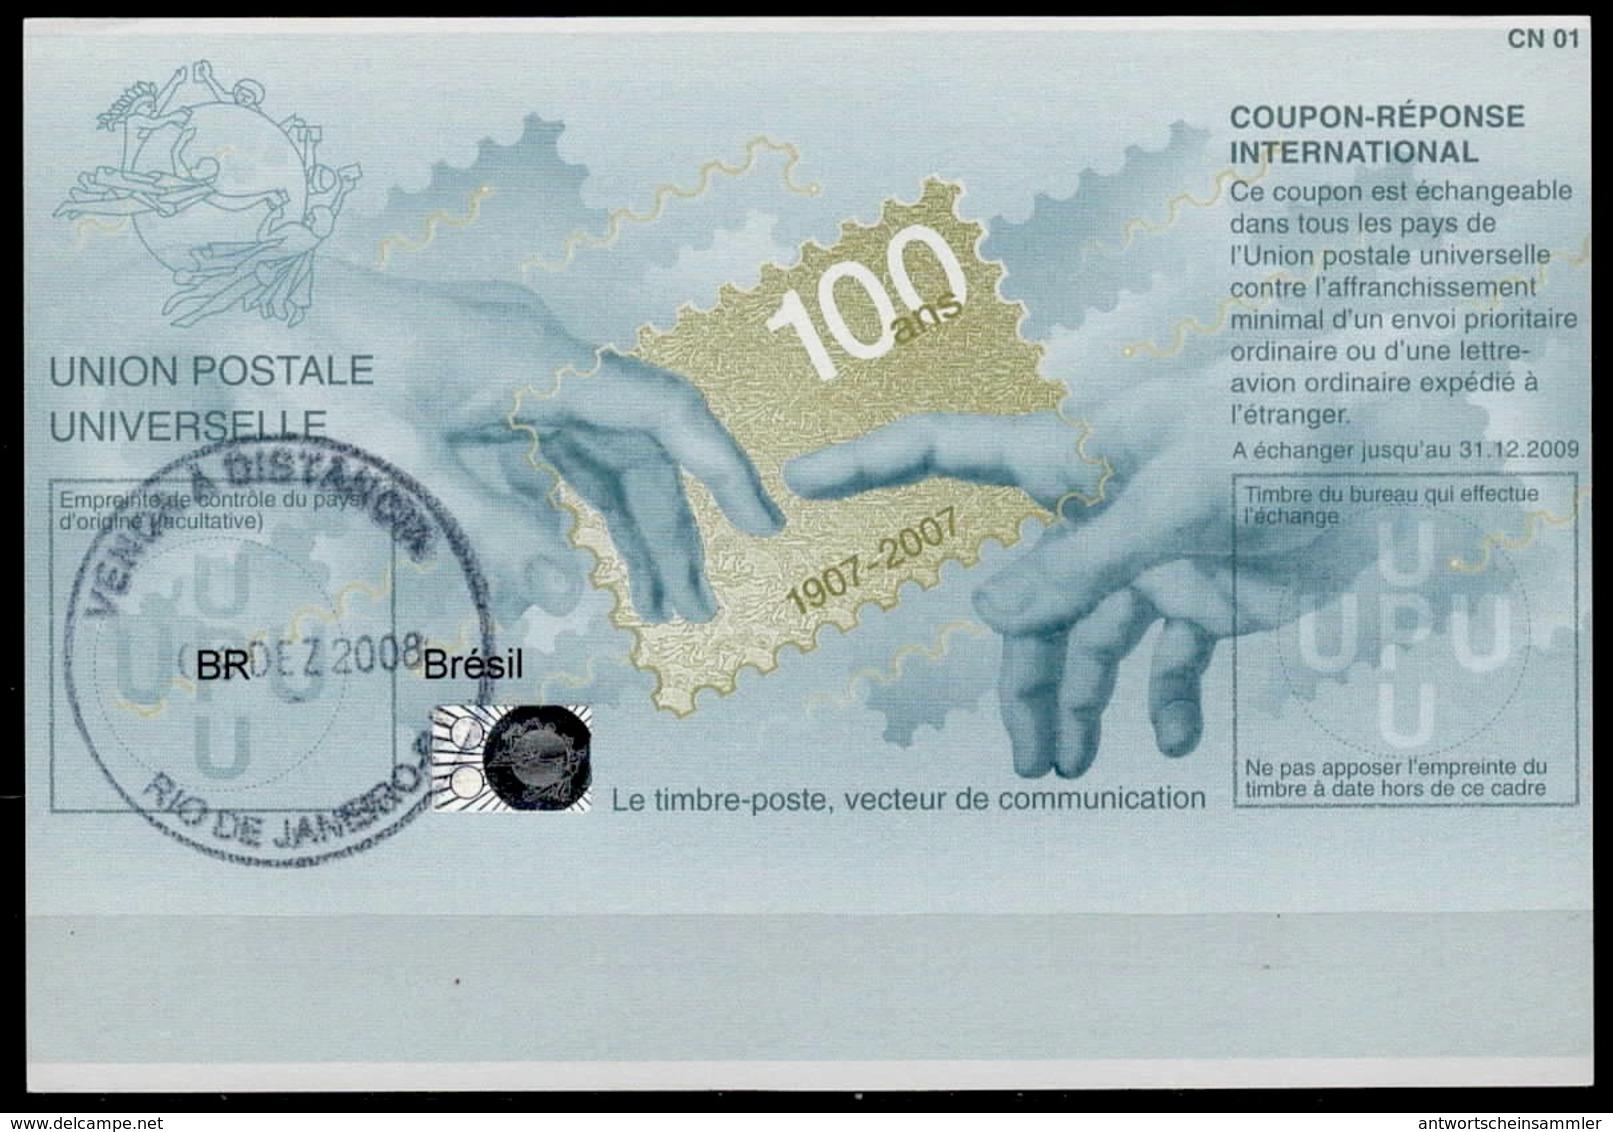 BRESIL BRAZIL Pe33 100 YEARS 20070322 GA Int. Reply Coupon Reponse Antwortschein IAS IRC Hologram O RIO DE JANEIRO - Postal Stationery